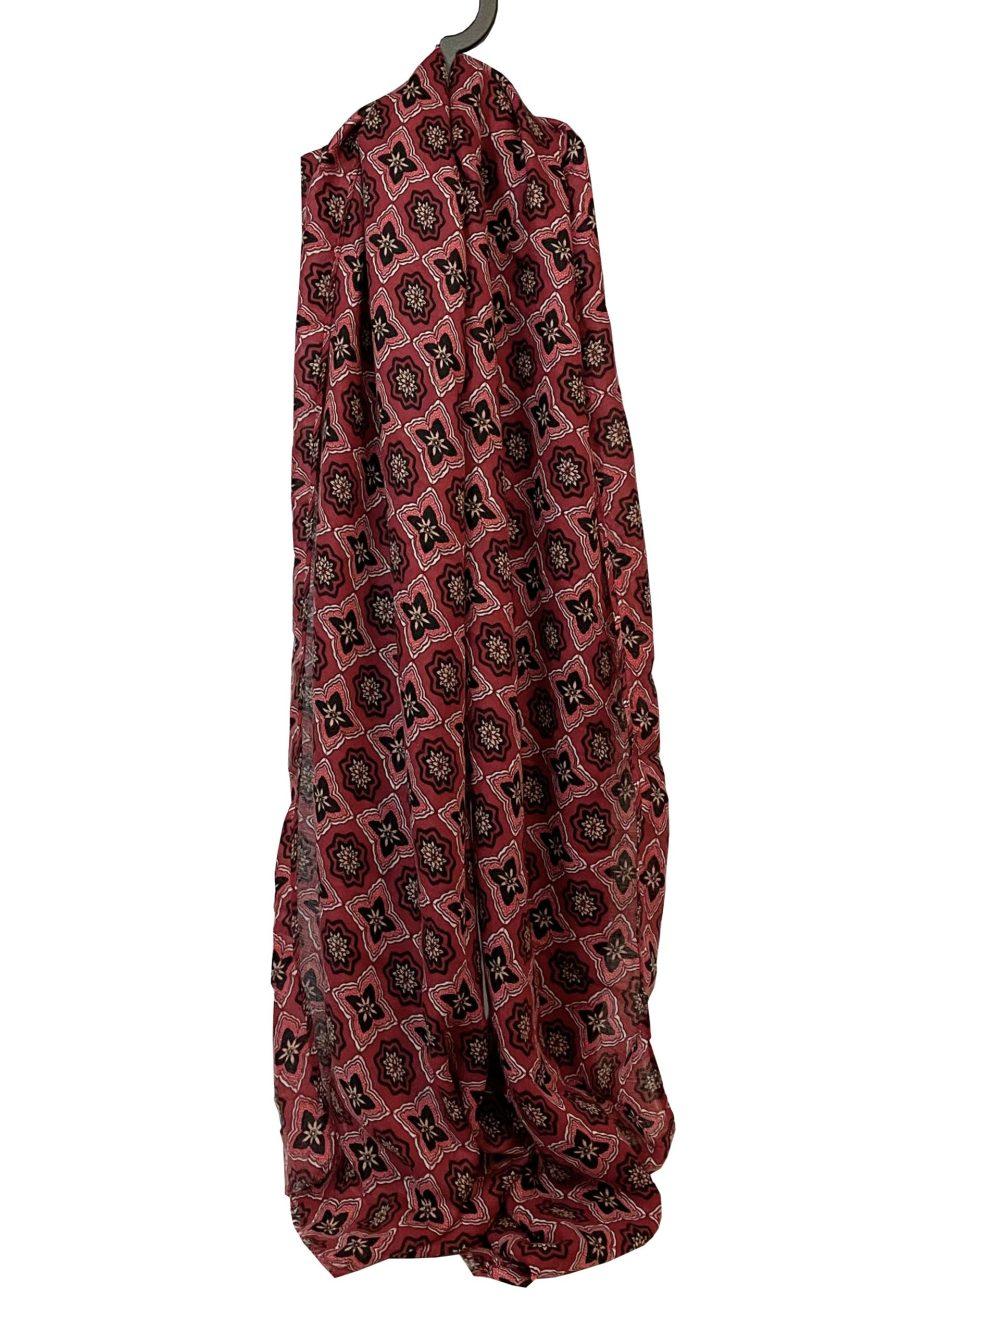 Sjaal bloem ruit rood